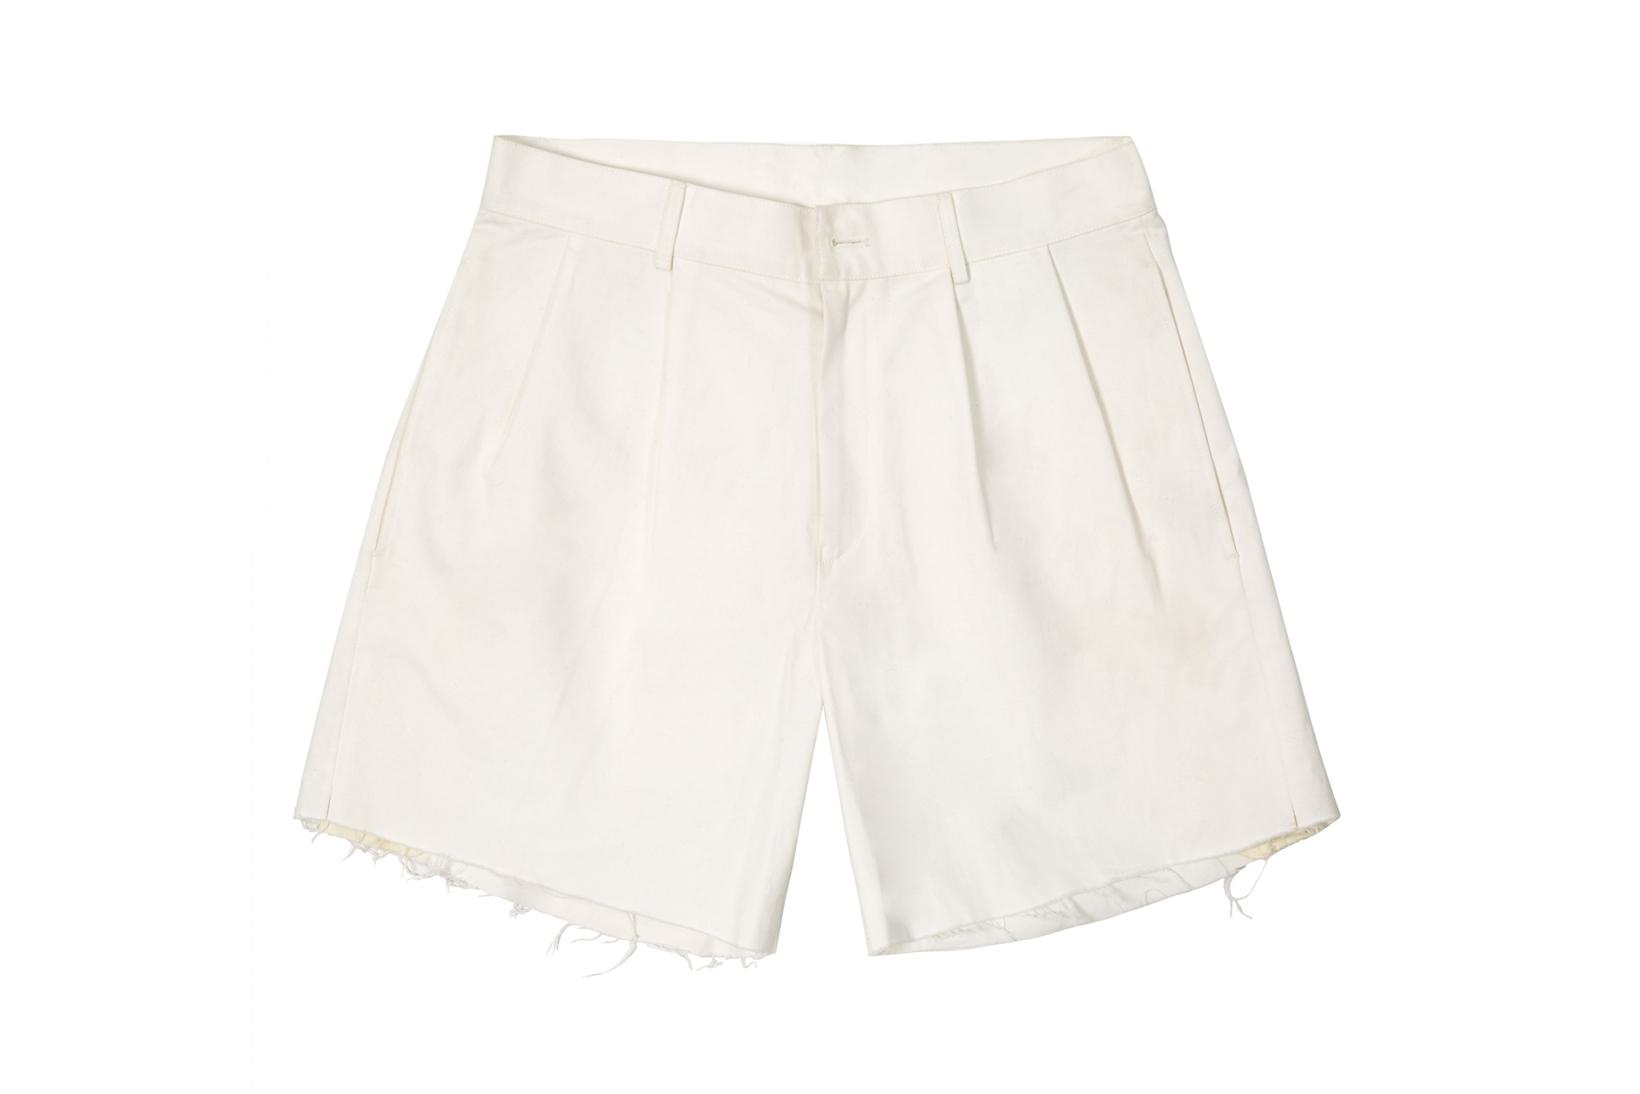 Gosha Rubchinskiy Kappa Collections Apparel Sportswear Tracksuits - 3764471